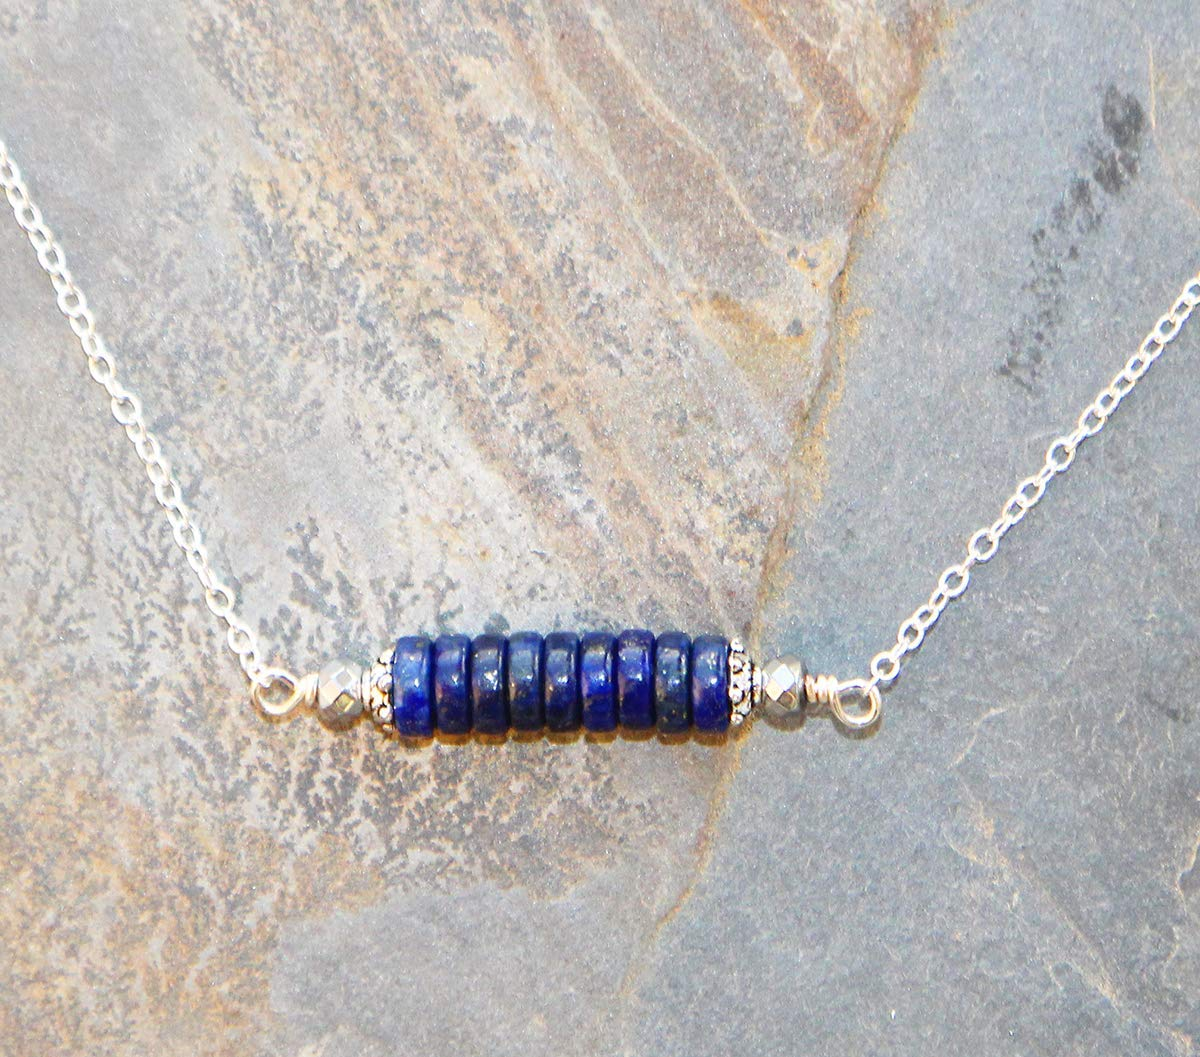 Lapis Lazuli Necklace, Royal Blue Necklace, Lapis Necklace, Blue Necklace, Bar Necklace, Natural Stone Necklace, September Necklace, For Her